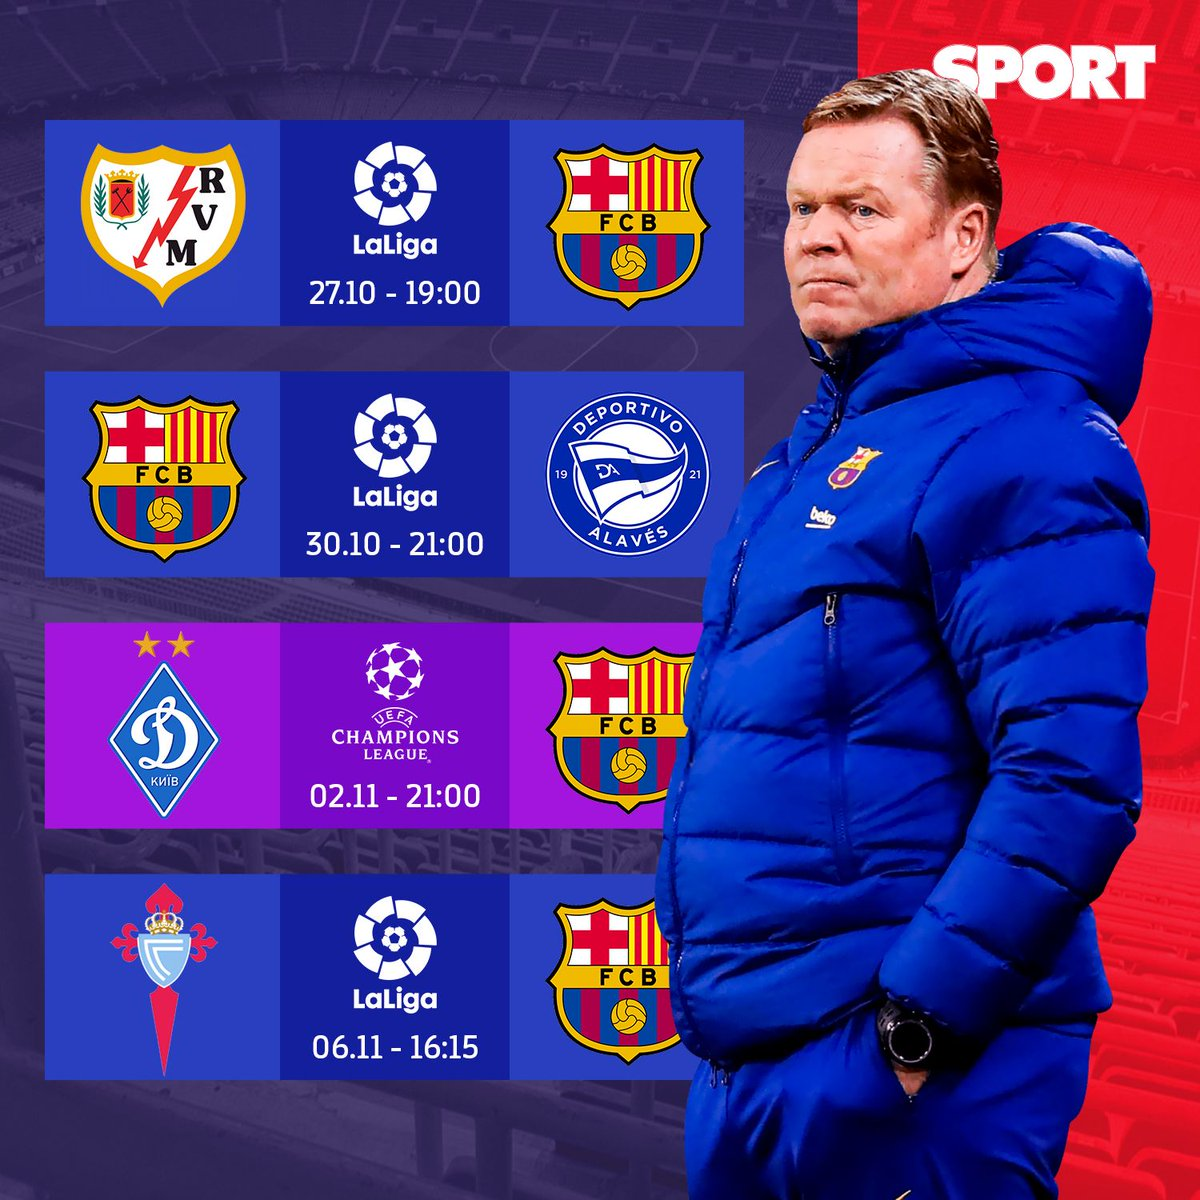 @sport's photo on Barca